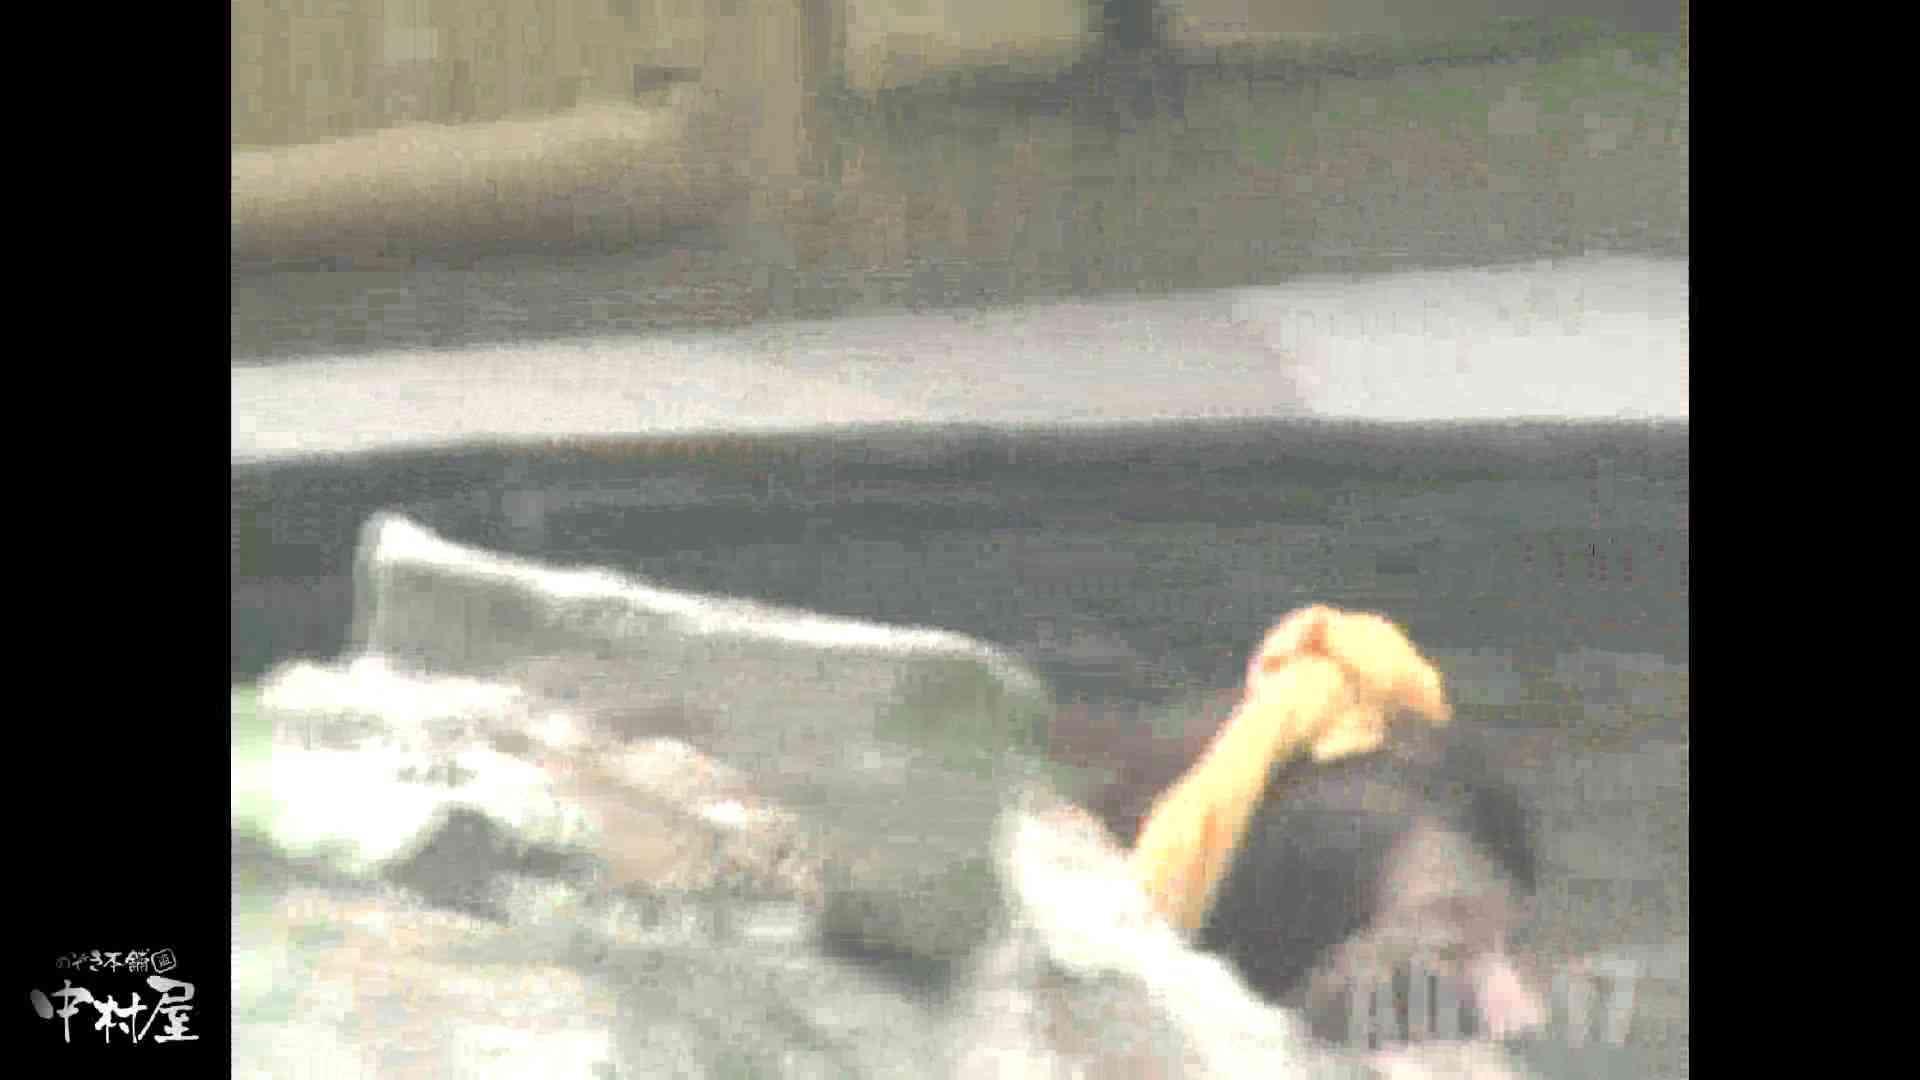 Aquaな露天風呂Vol.881潜入盗撮露天風呂十七判湯 其の五 美しいOLの裸体 オマンコ無修正動画無料 102pic 66